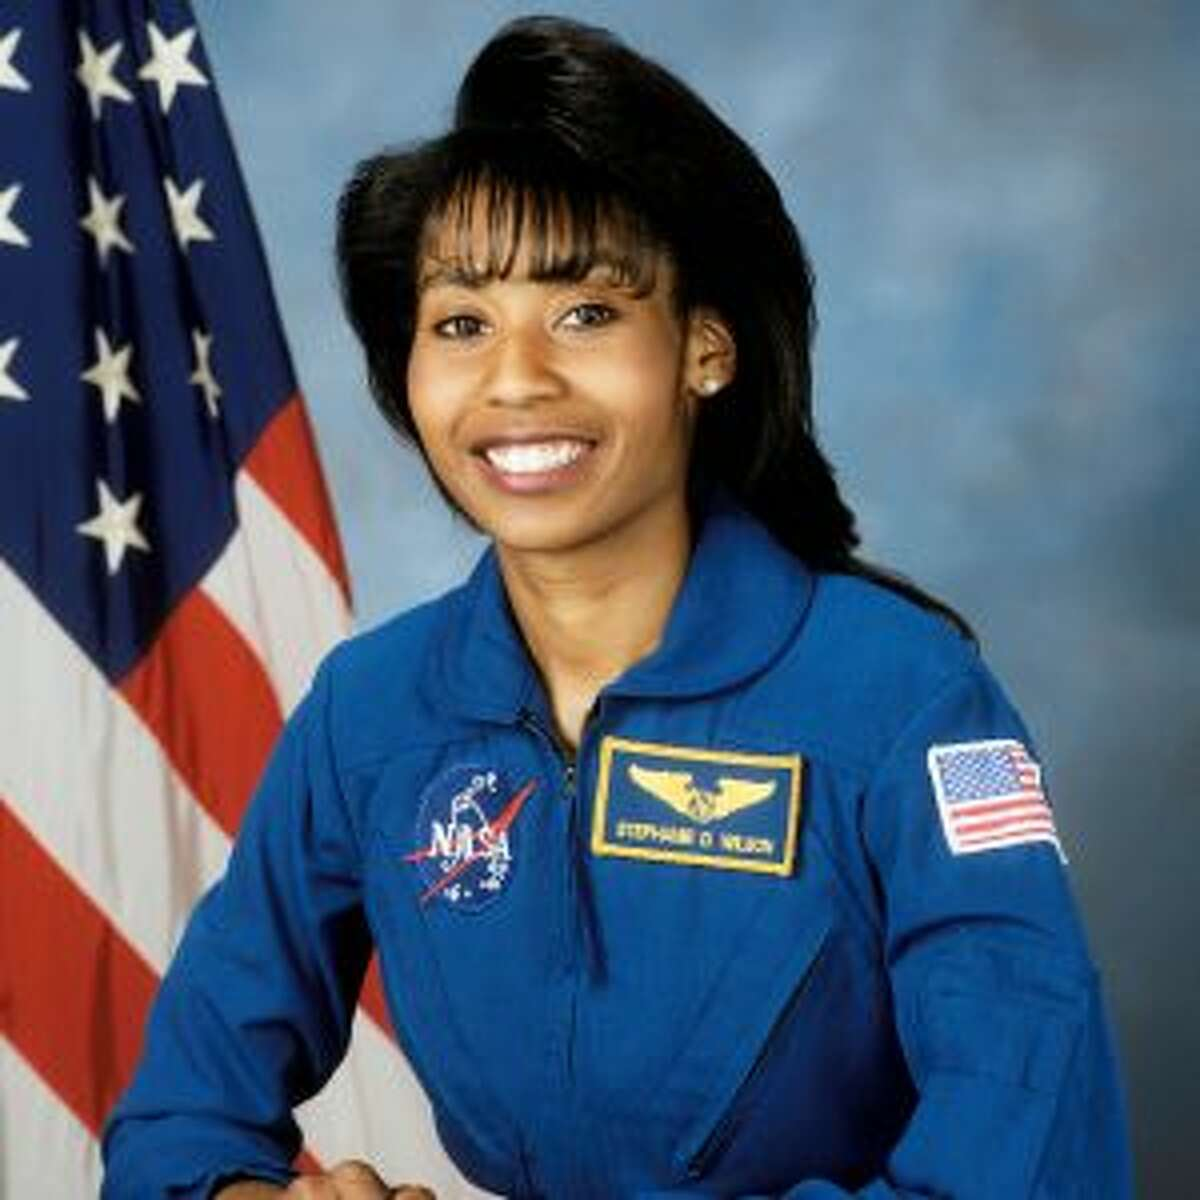 NASA Astronaut Stephanie Wilson (Provided photo)